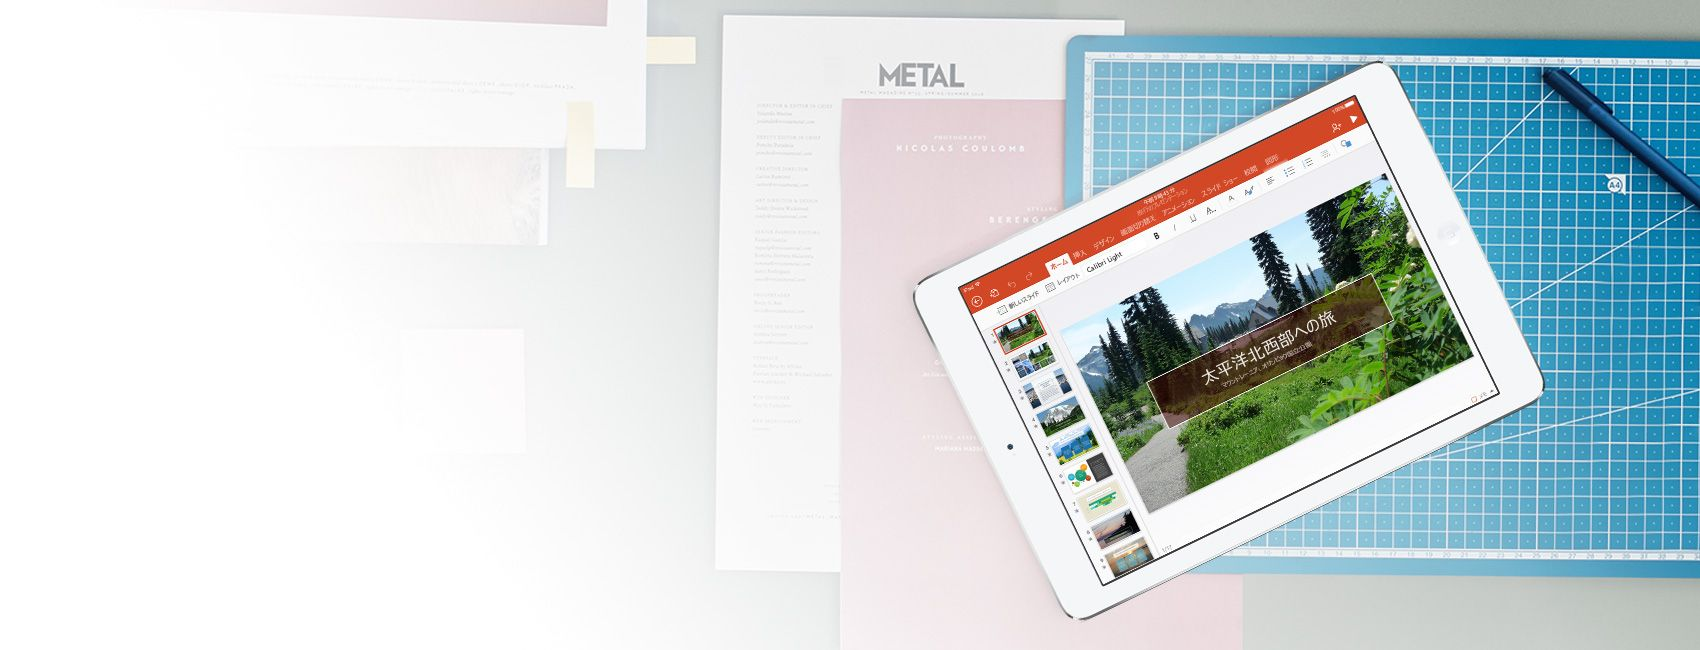 iPad に、太平洋北西部への旅に関する PowerPoint プレゼンテーションが表示されています